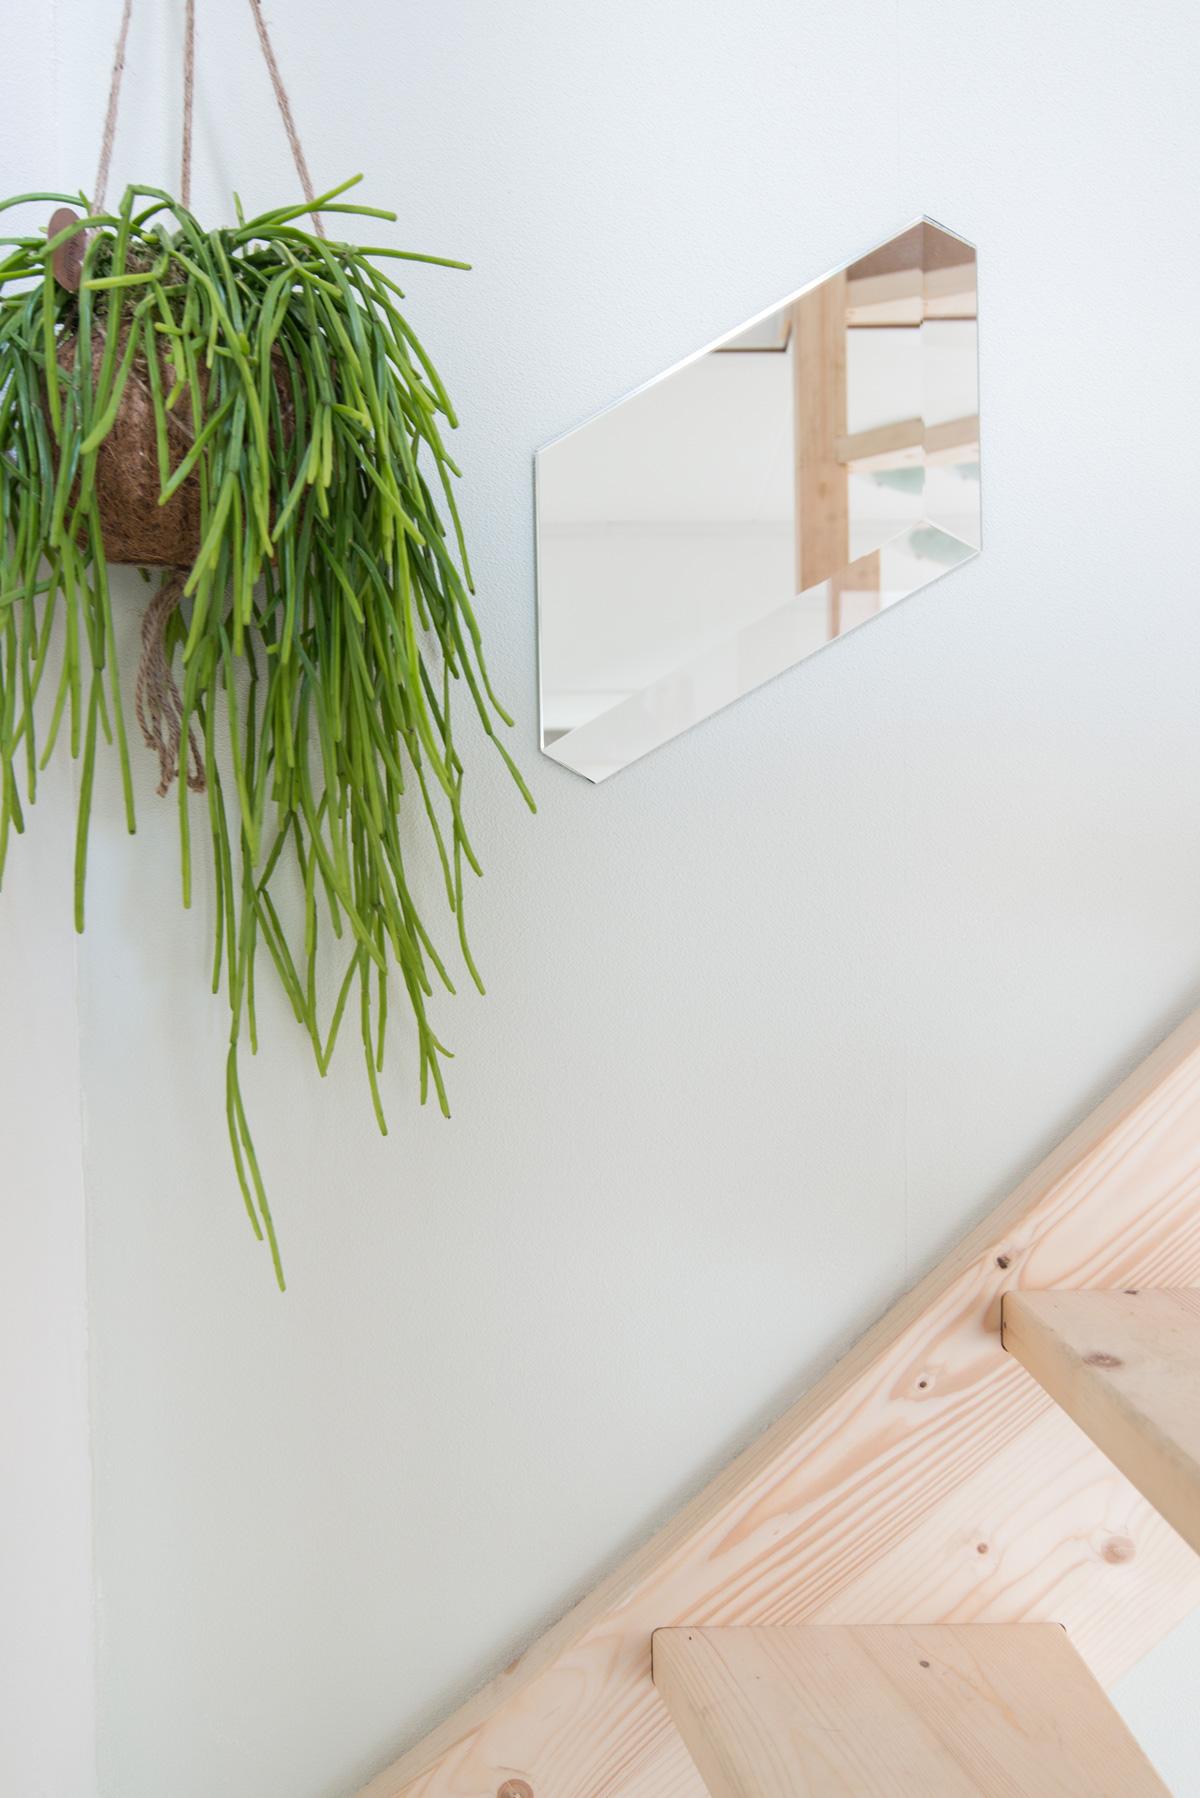 puikdesign facett spiegel mirror plants hangplant hallway